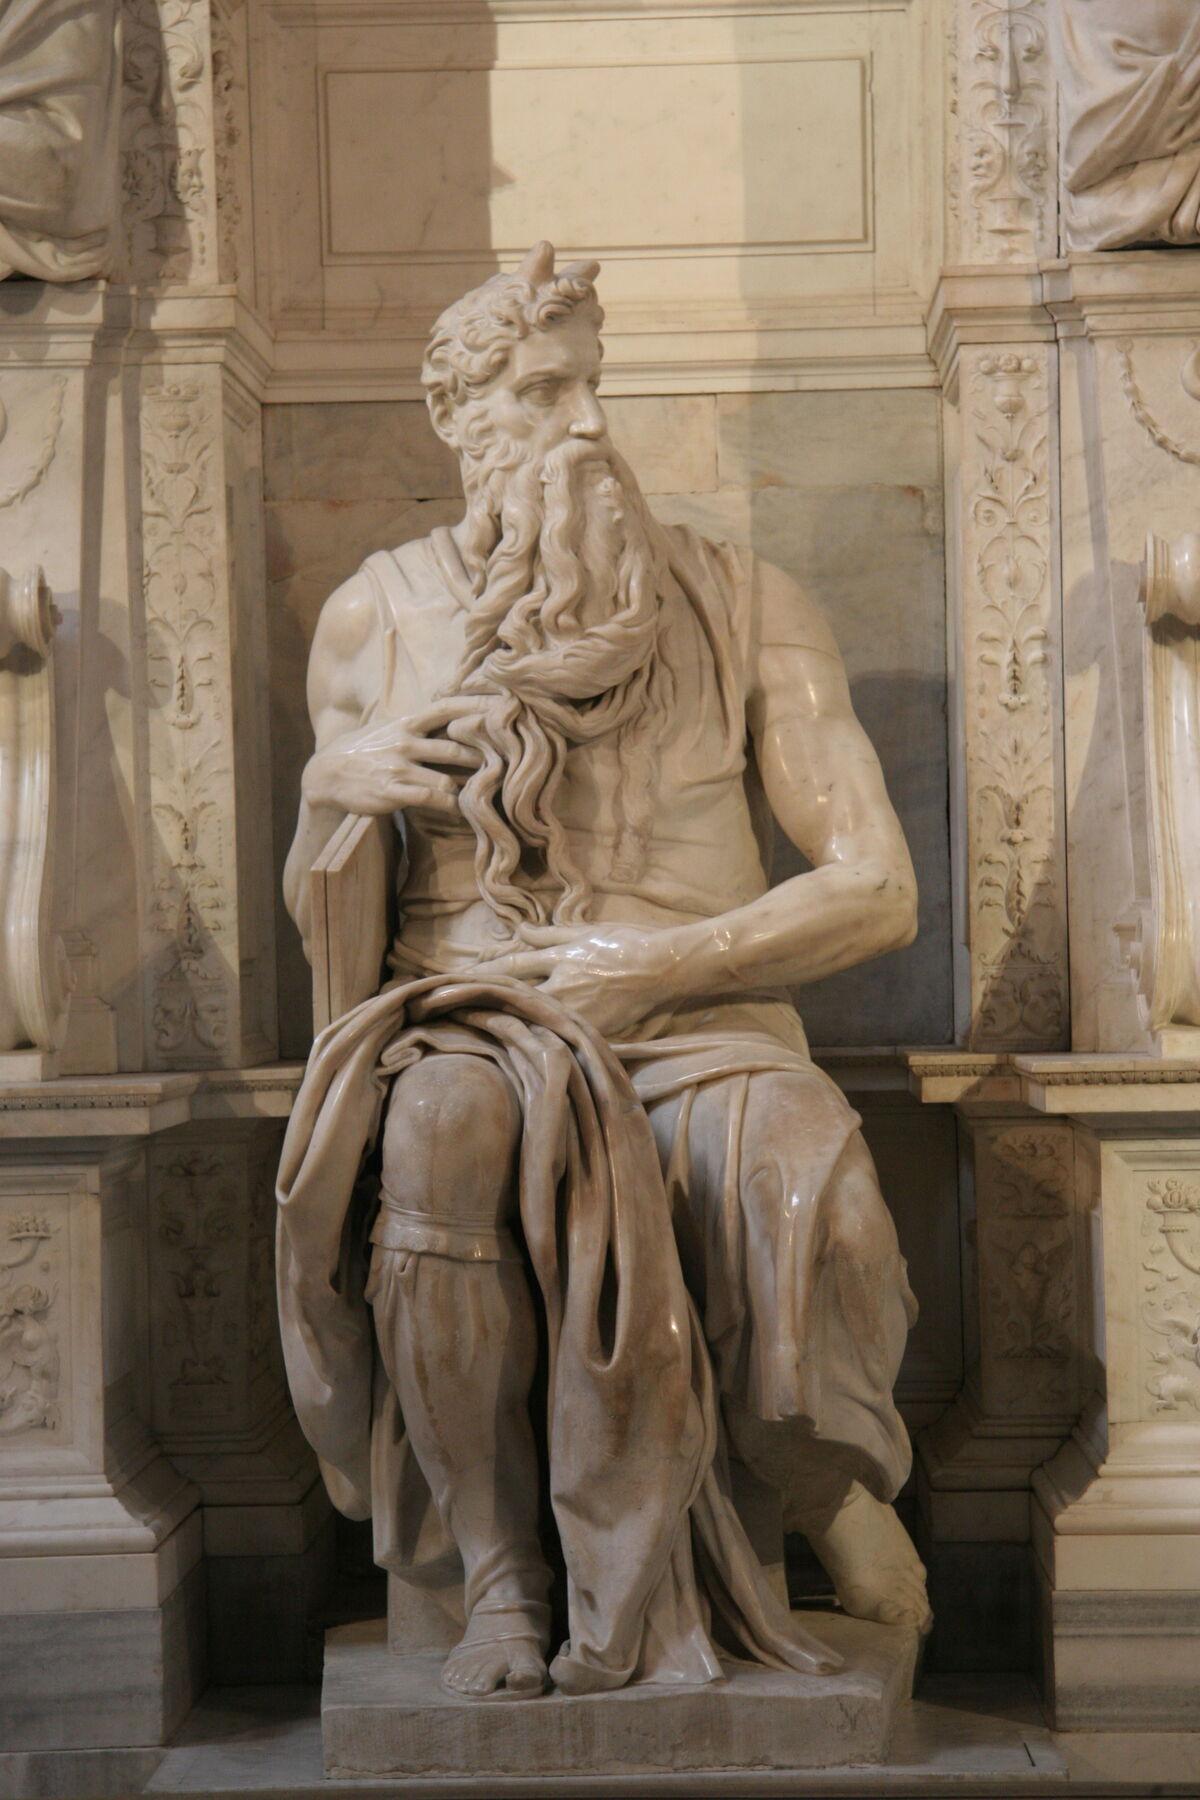 Michelangelo Buonarroti, Moses, 1513–15. Image via Wikimedia Commons.